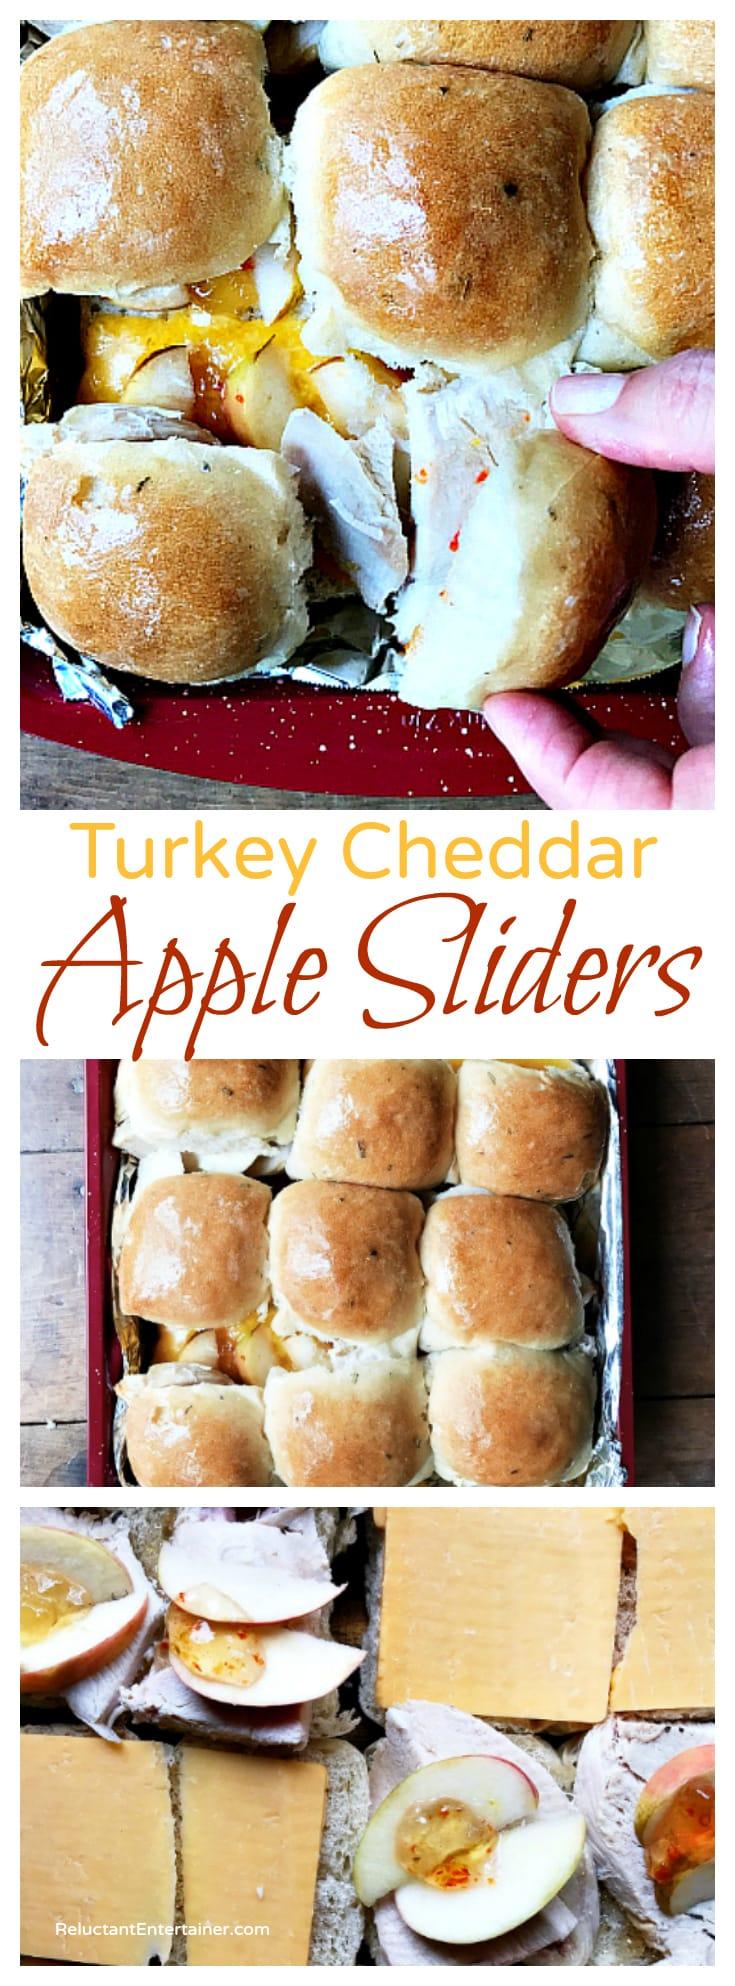 Turkey Cheddar Apple Sliders